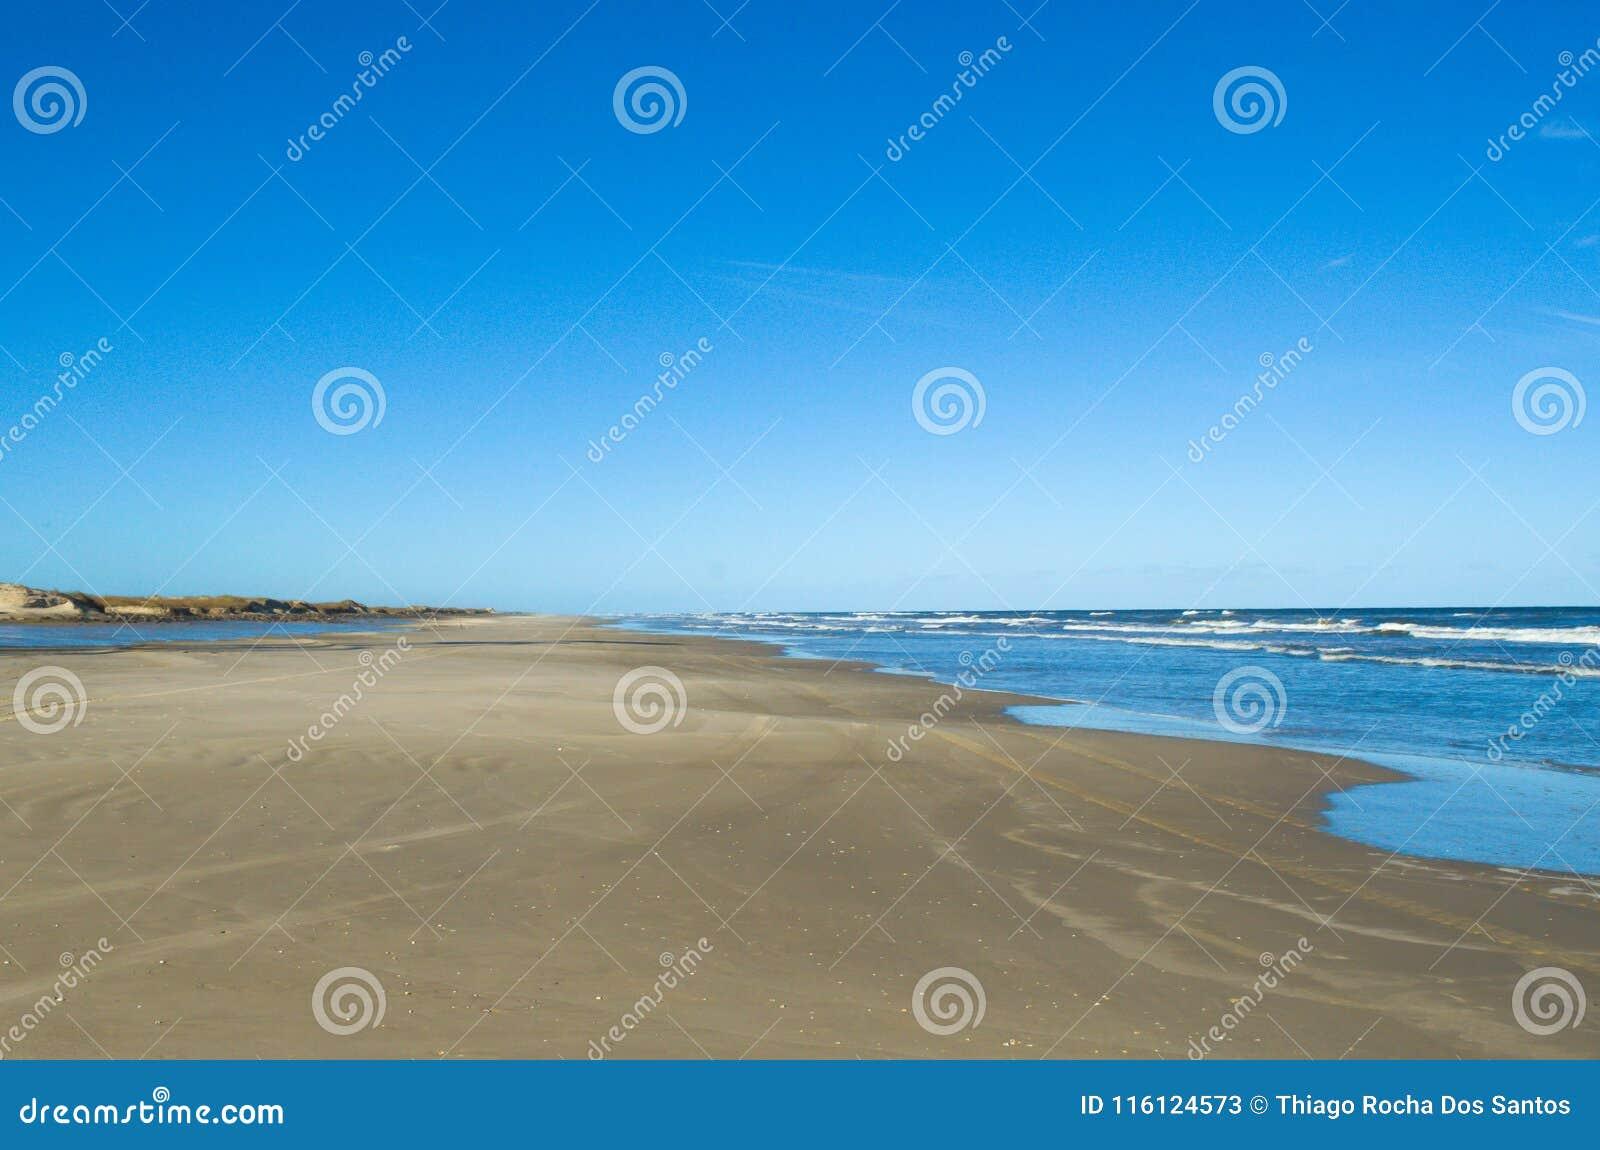 Bojuru beach, deserted beach